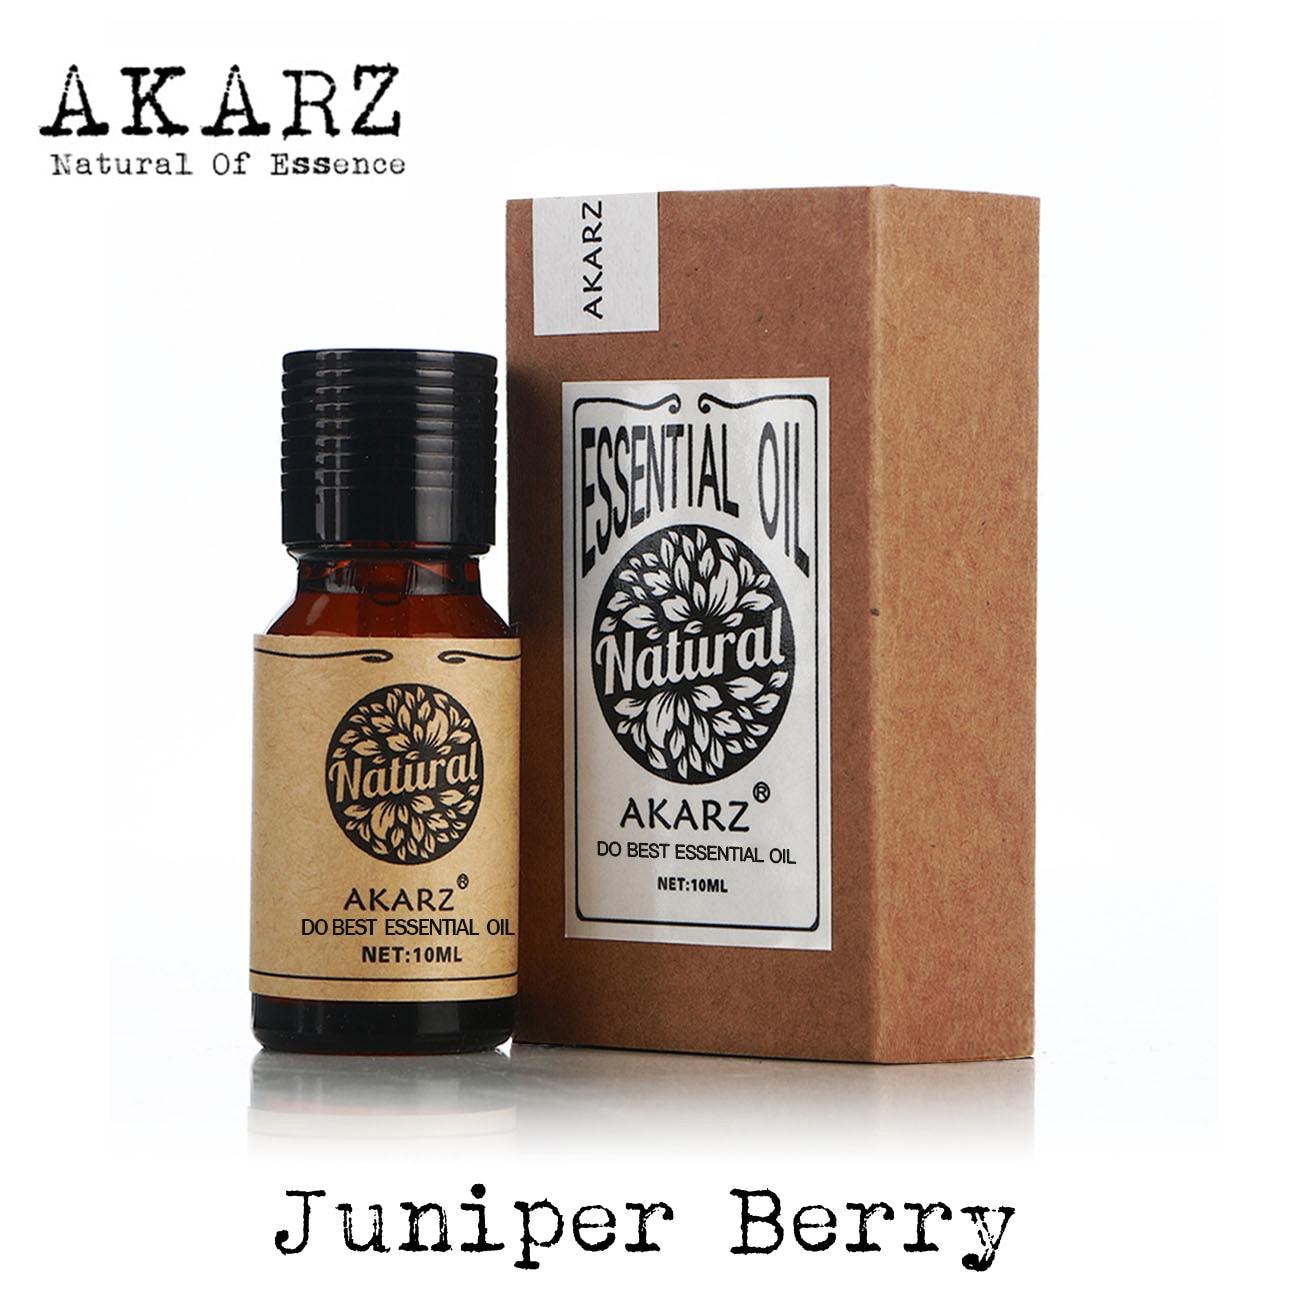 AKARZ Famous Brand Natural Juniper Berry Essential Oil Treatment Of Acne Skin Inflammation Juniper Berry Oil